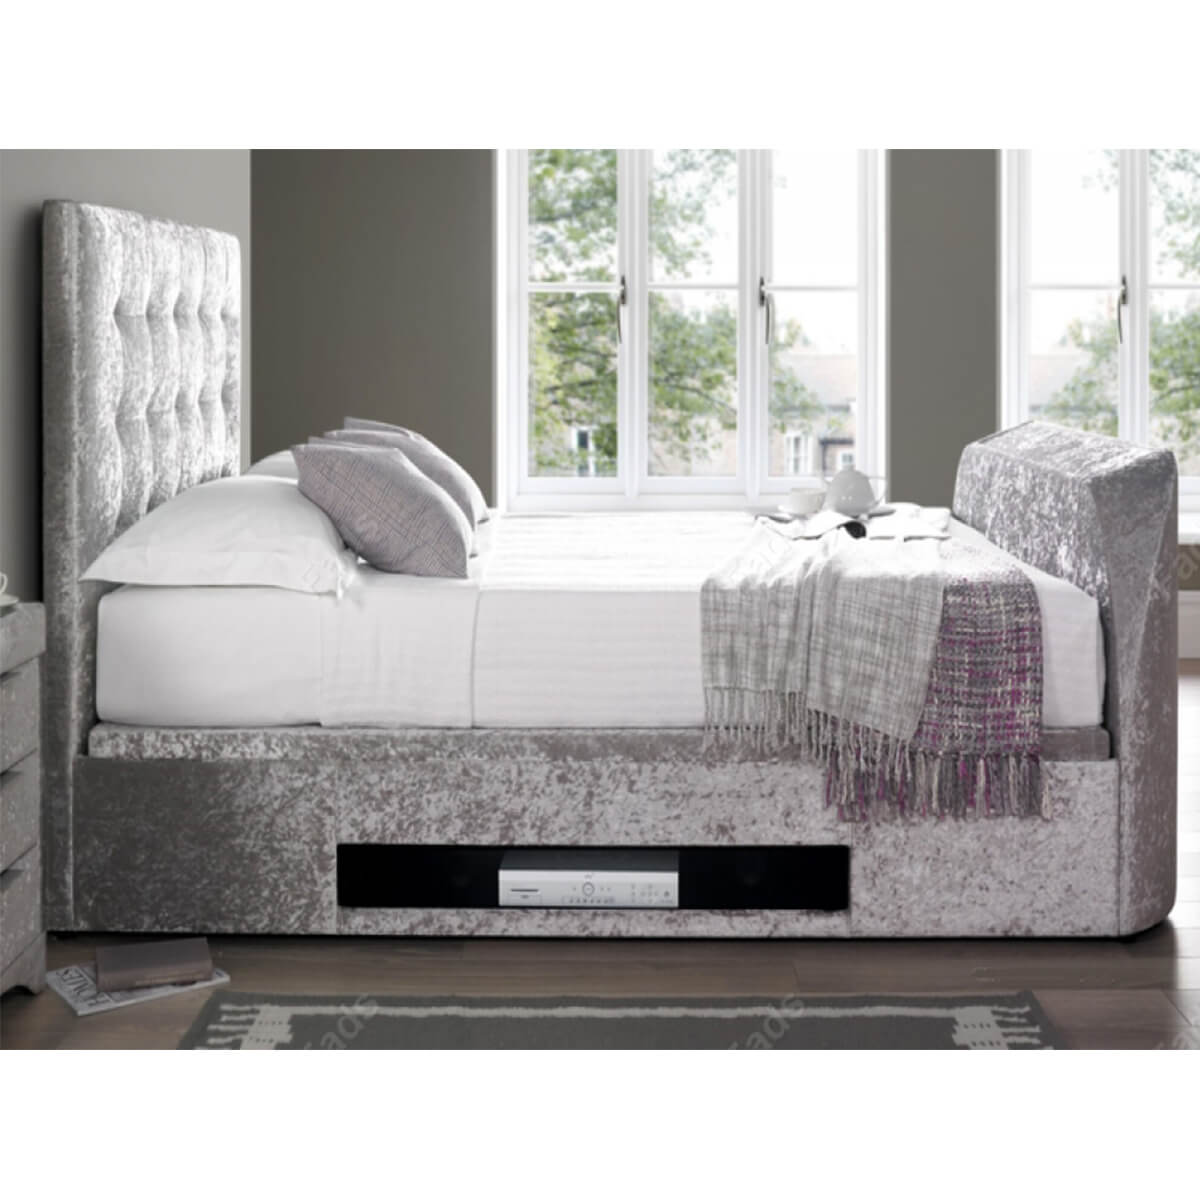 Kaydian Barnard Ottoman Tv Bed Crushed Velvet Silver Tv